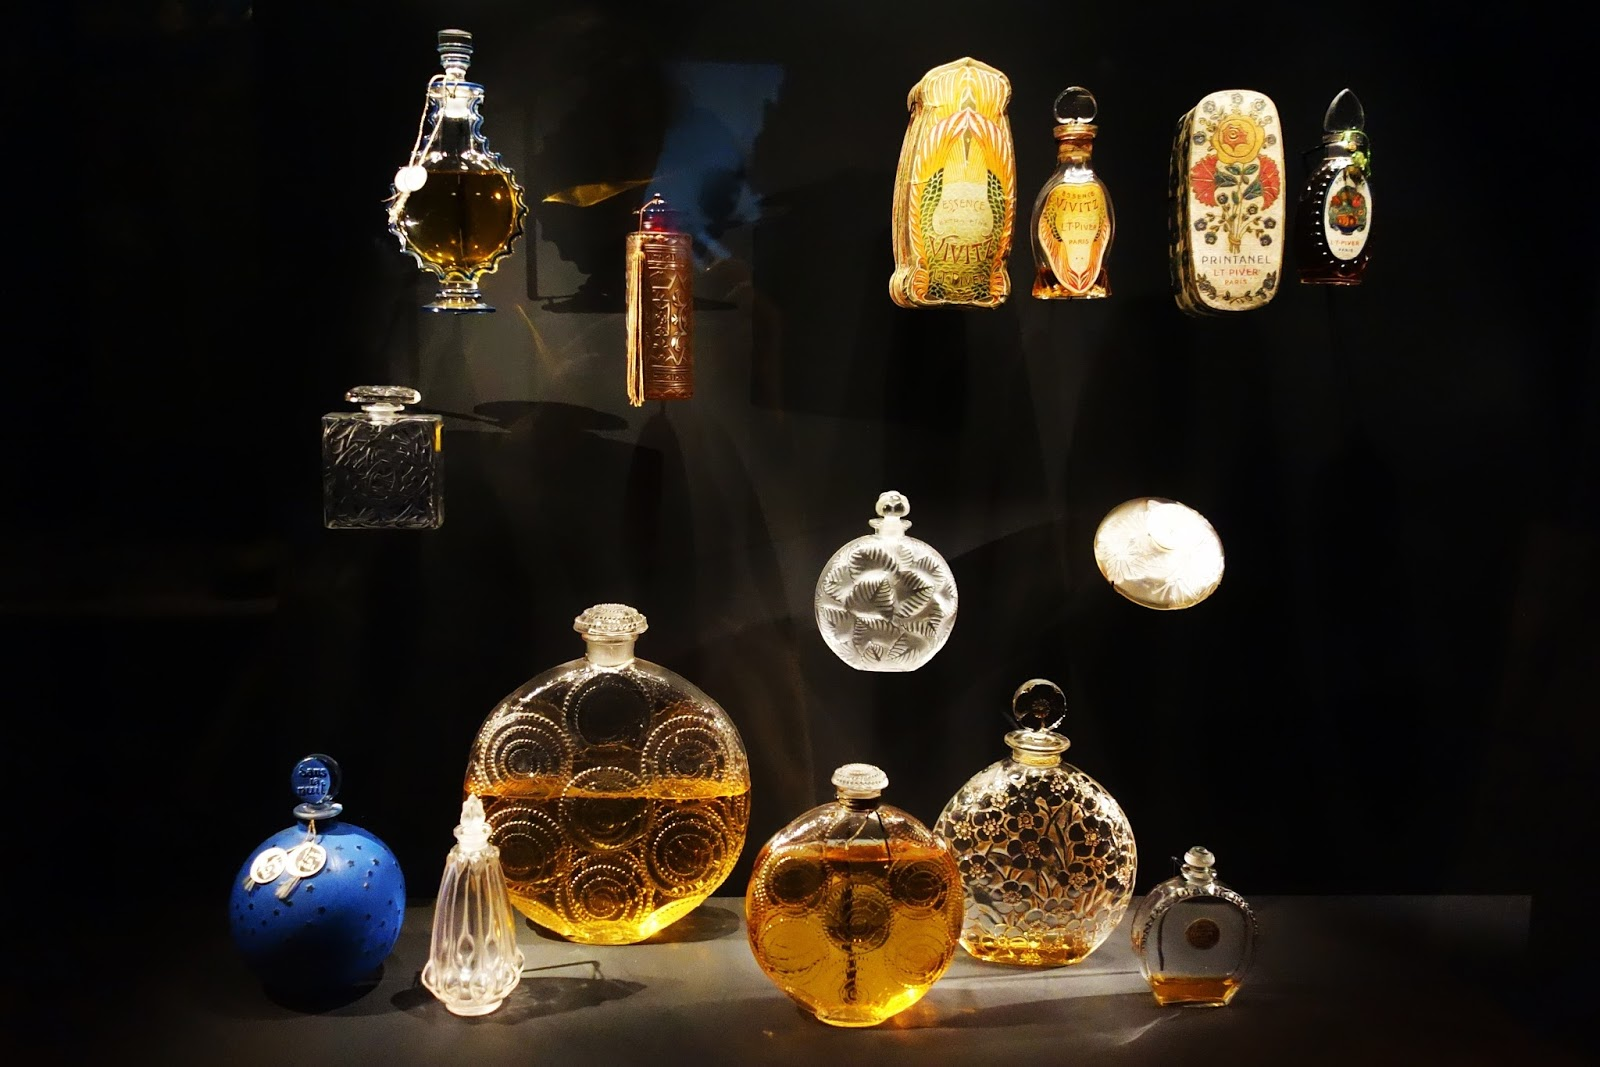 Out in paris smaragden en flacons - Fragonard musee paris ...